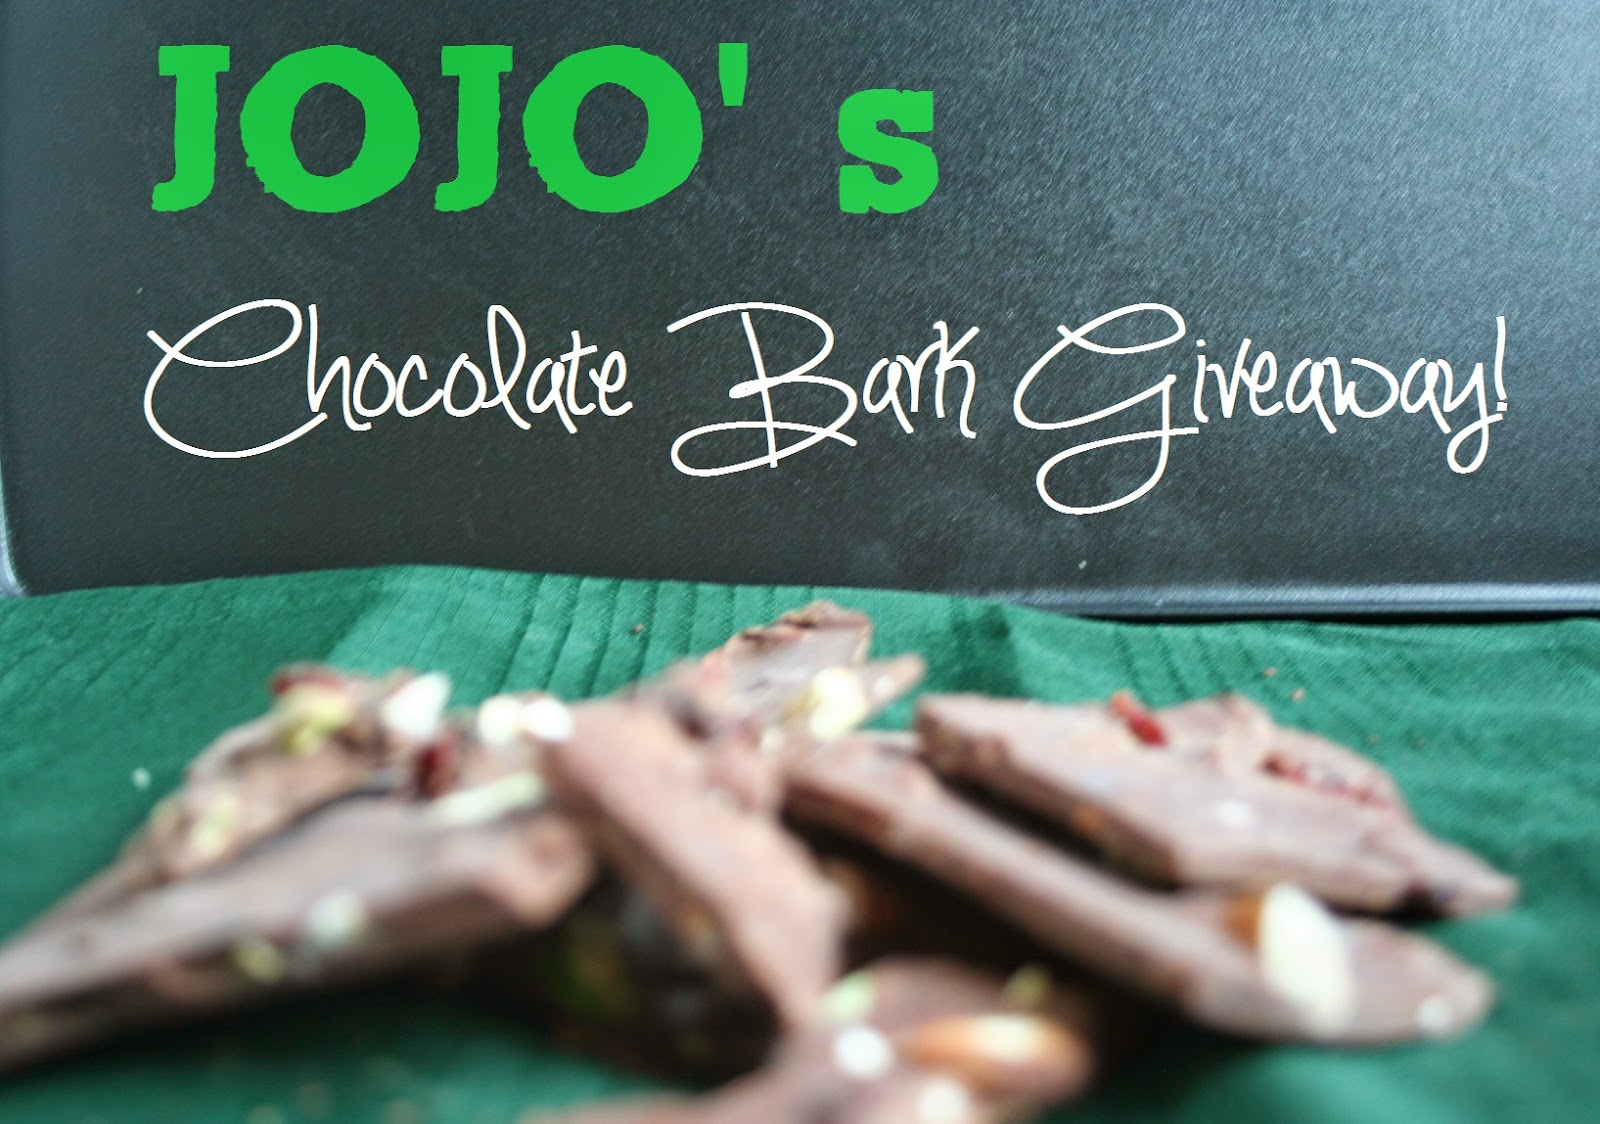 http://www.jojoschocolate.com/